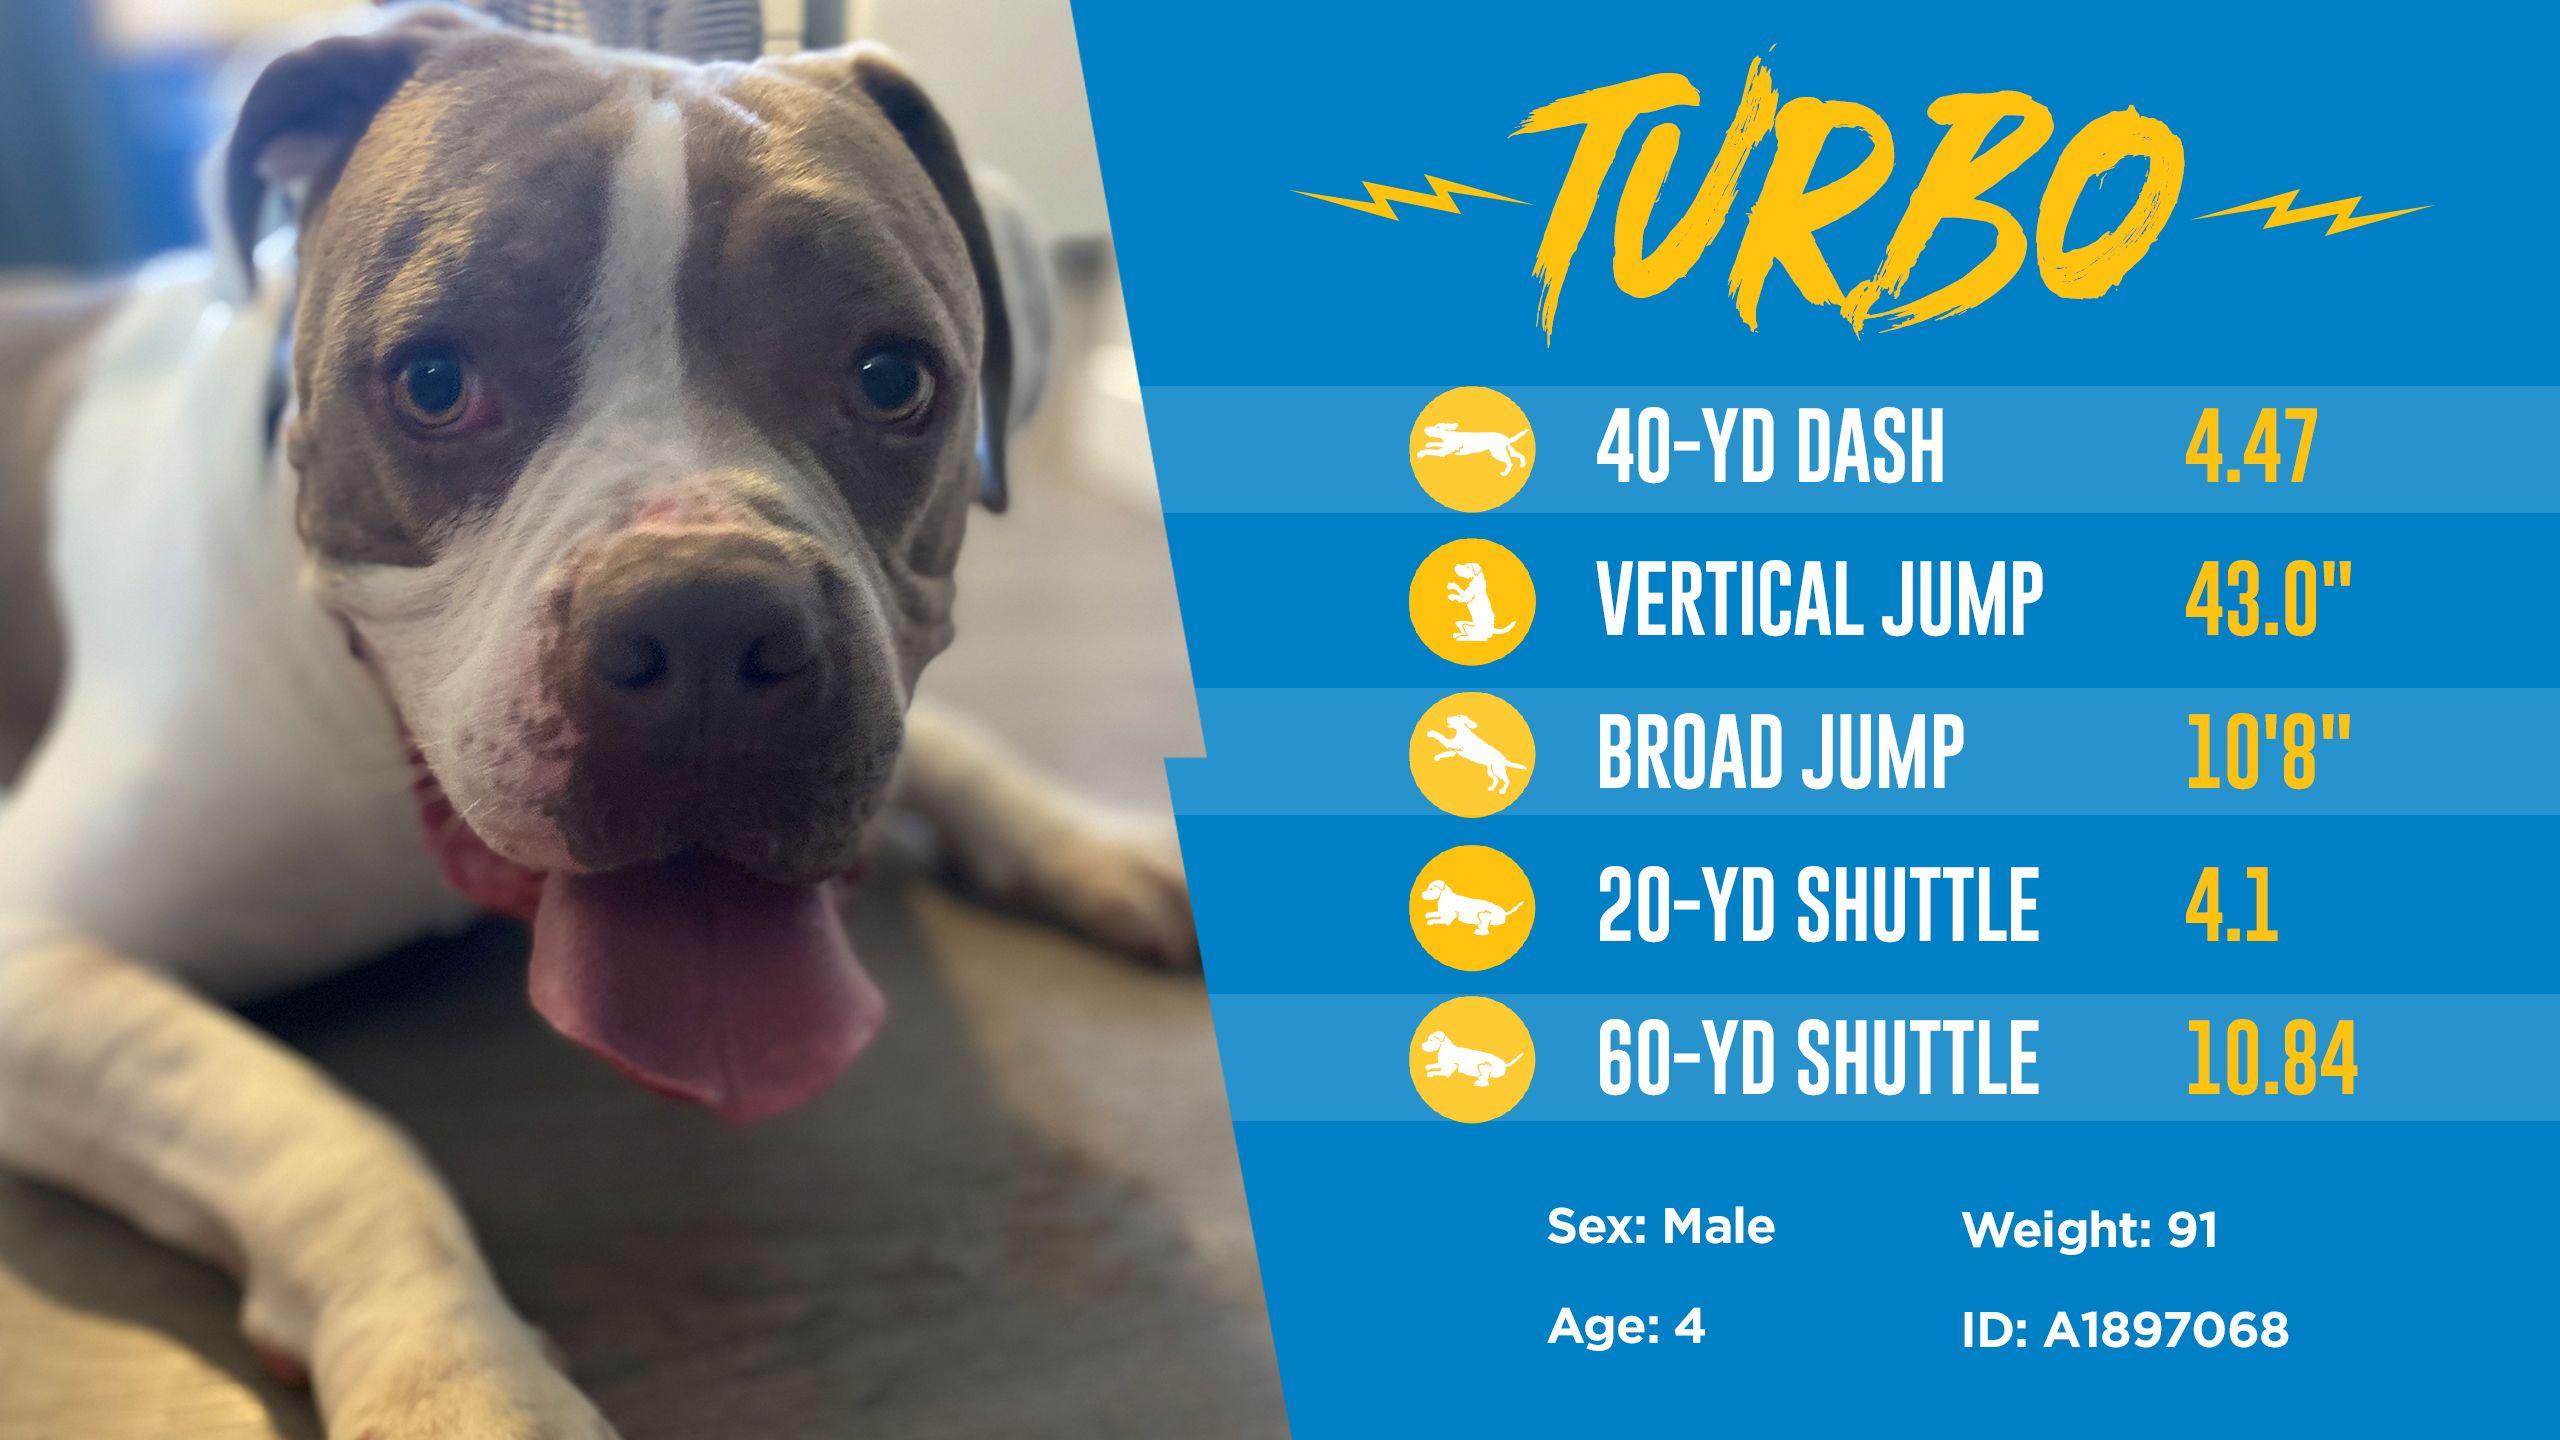 200501_Dog_Draft_Thumbnail_Turbo